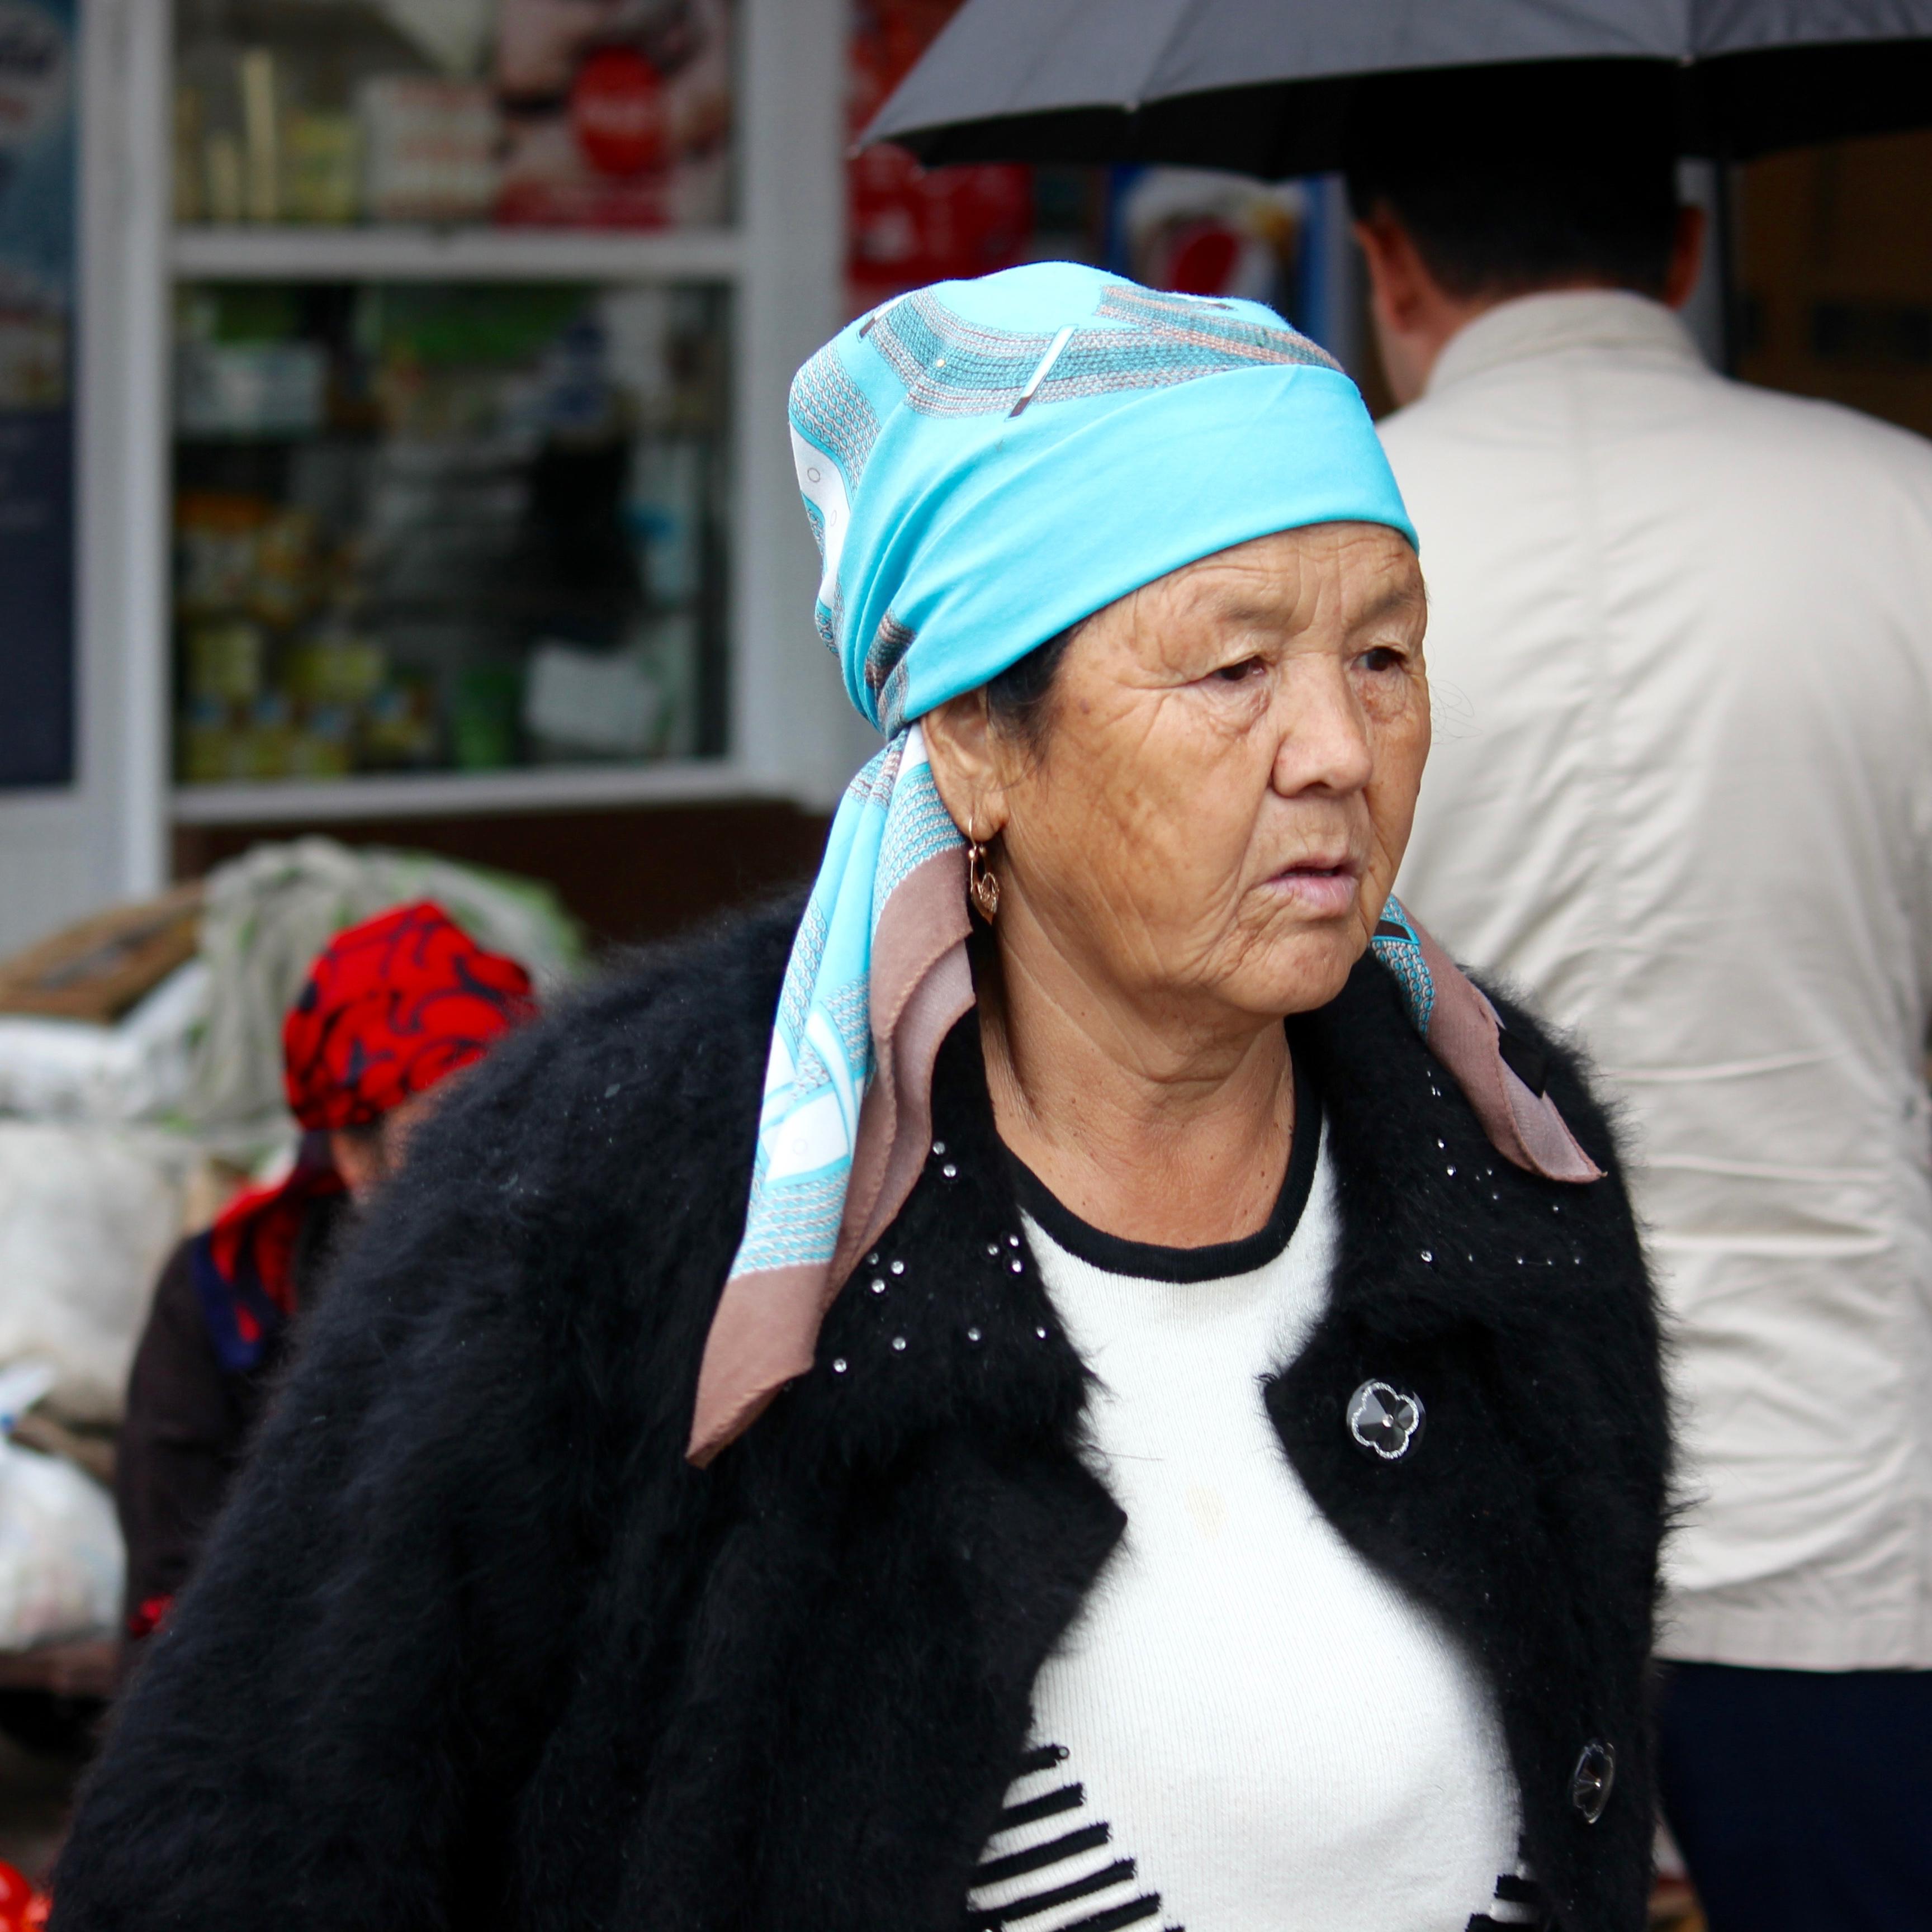 tashkent, uzbekistan - 9